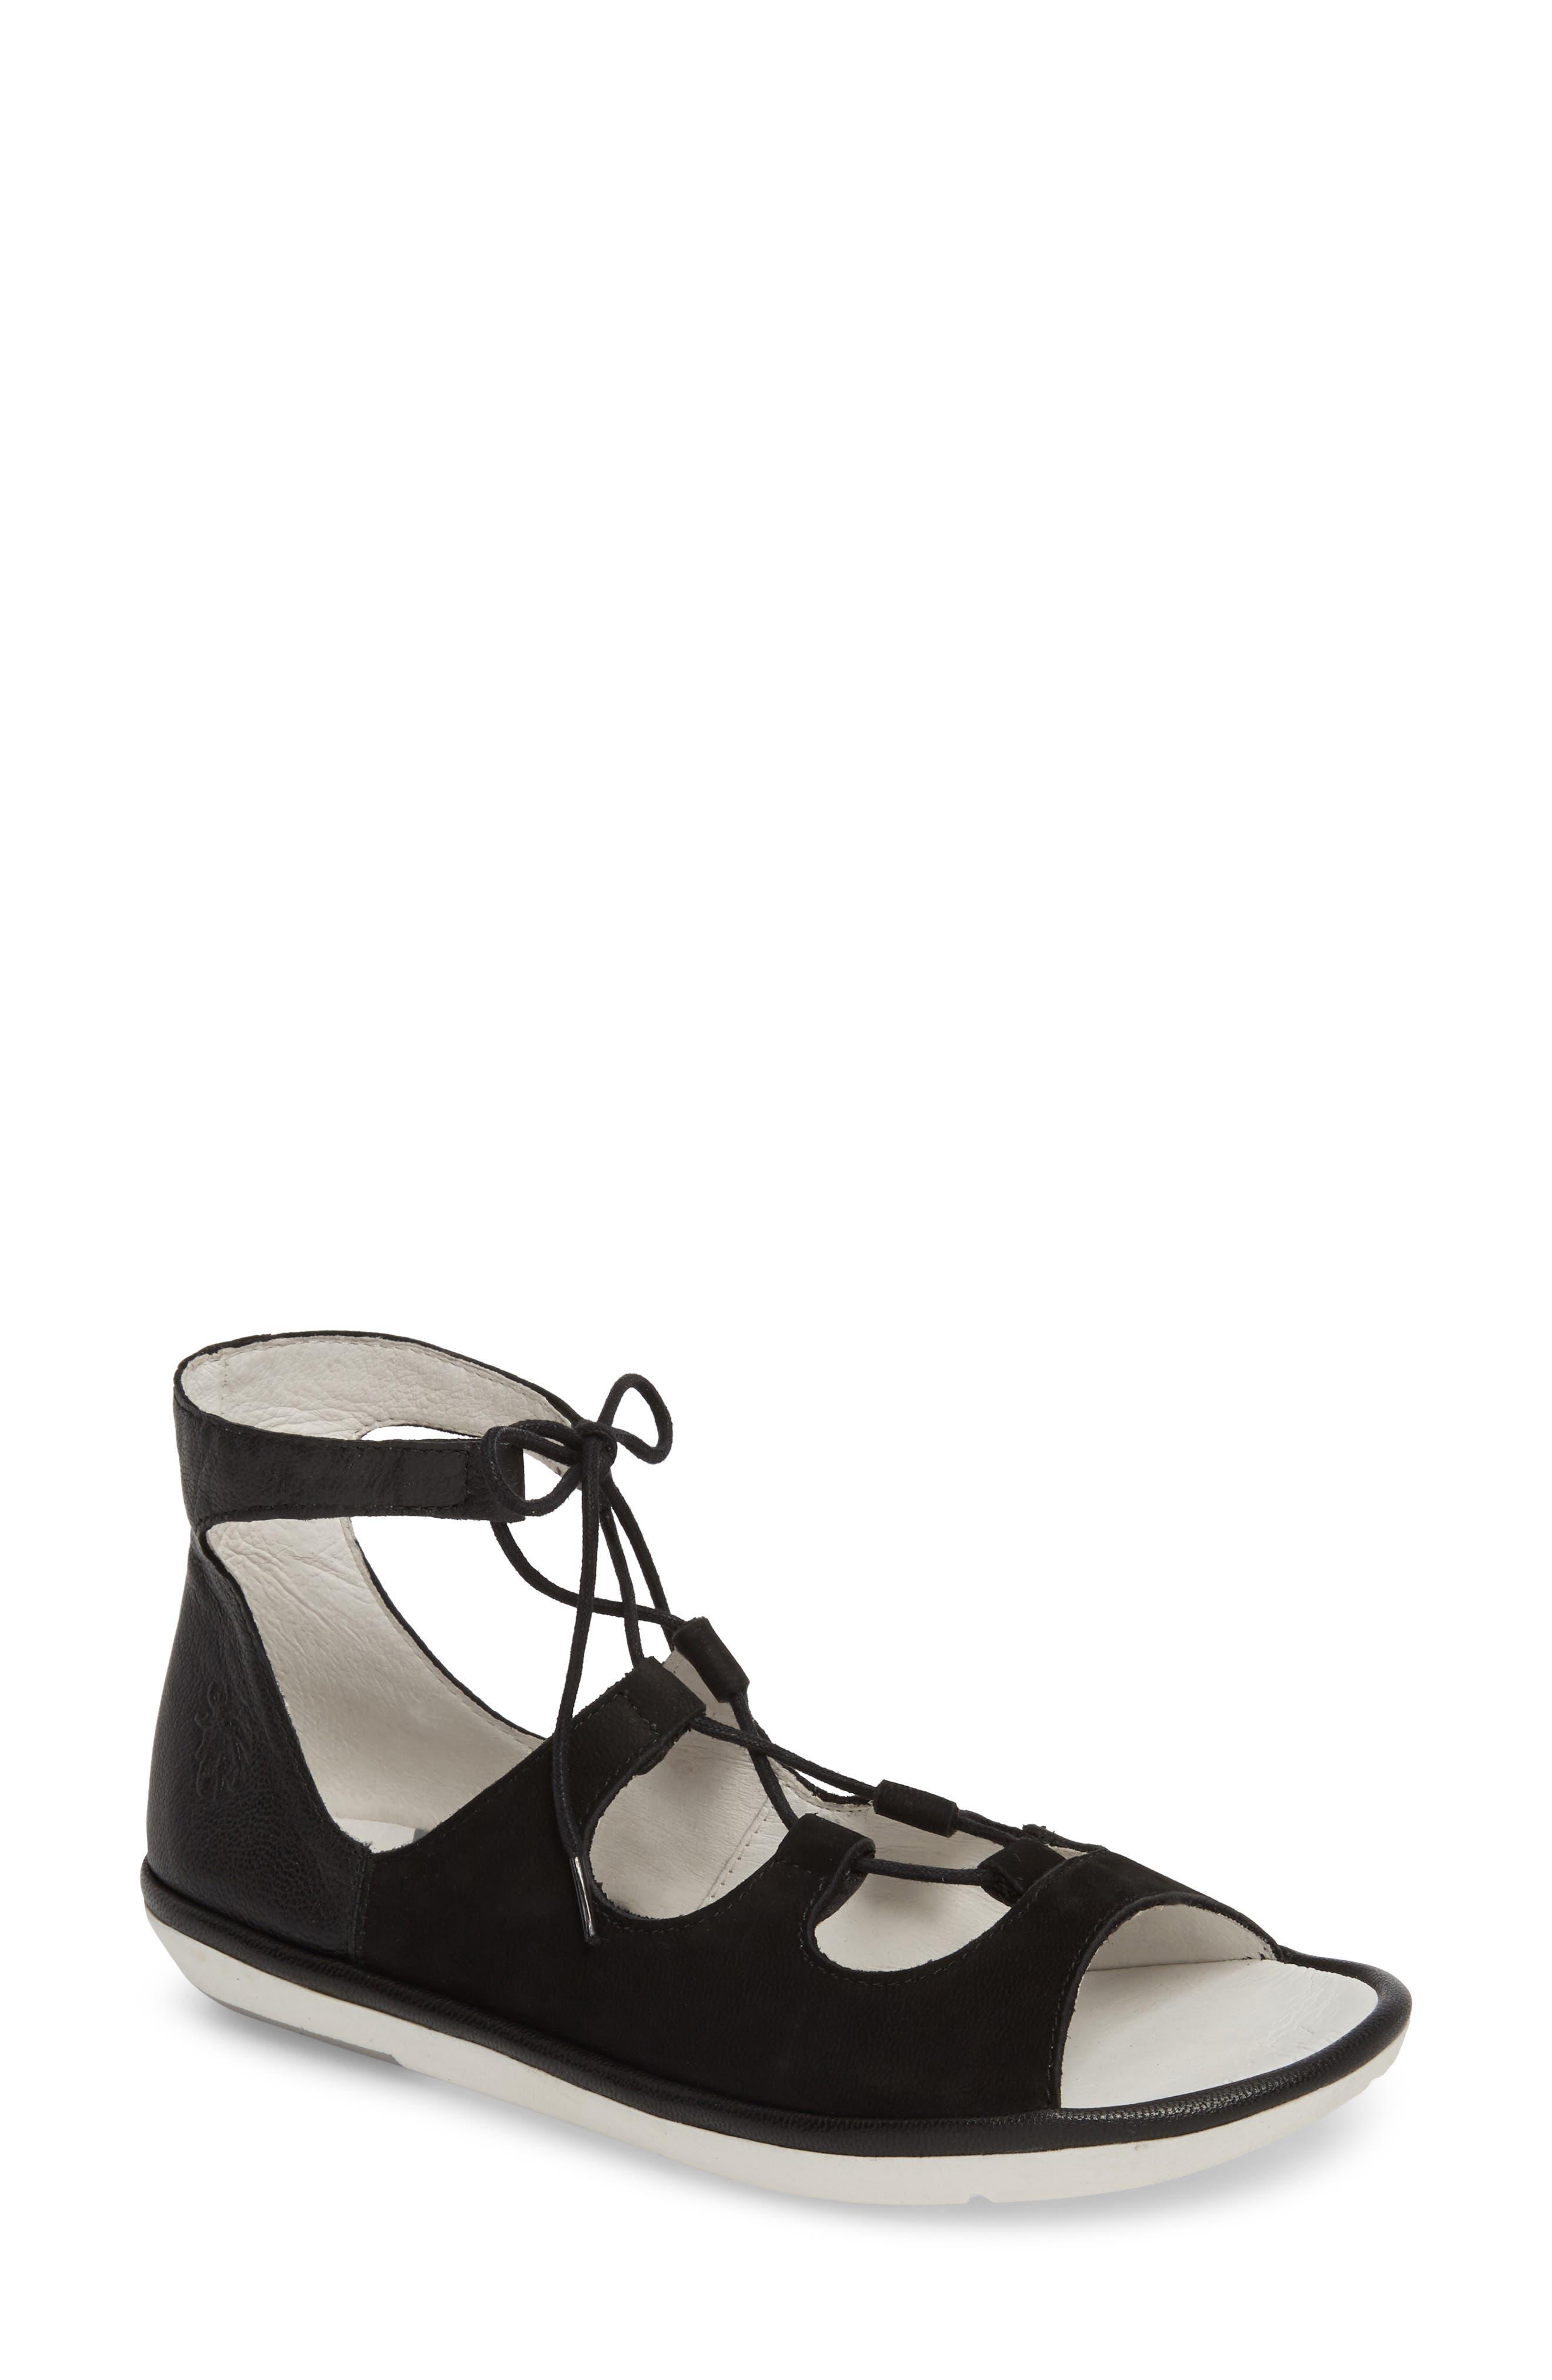 Mura Ghillie Sandal, Main, color, BLACK LEATHER